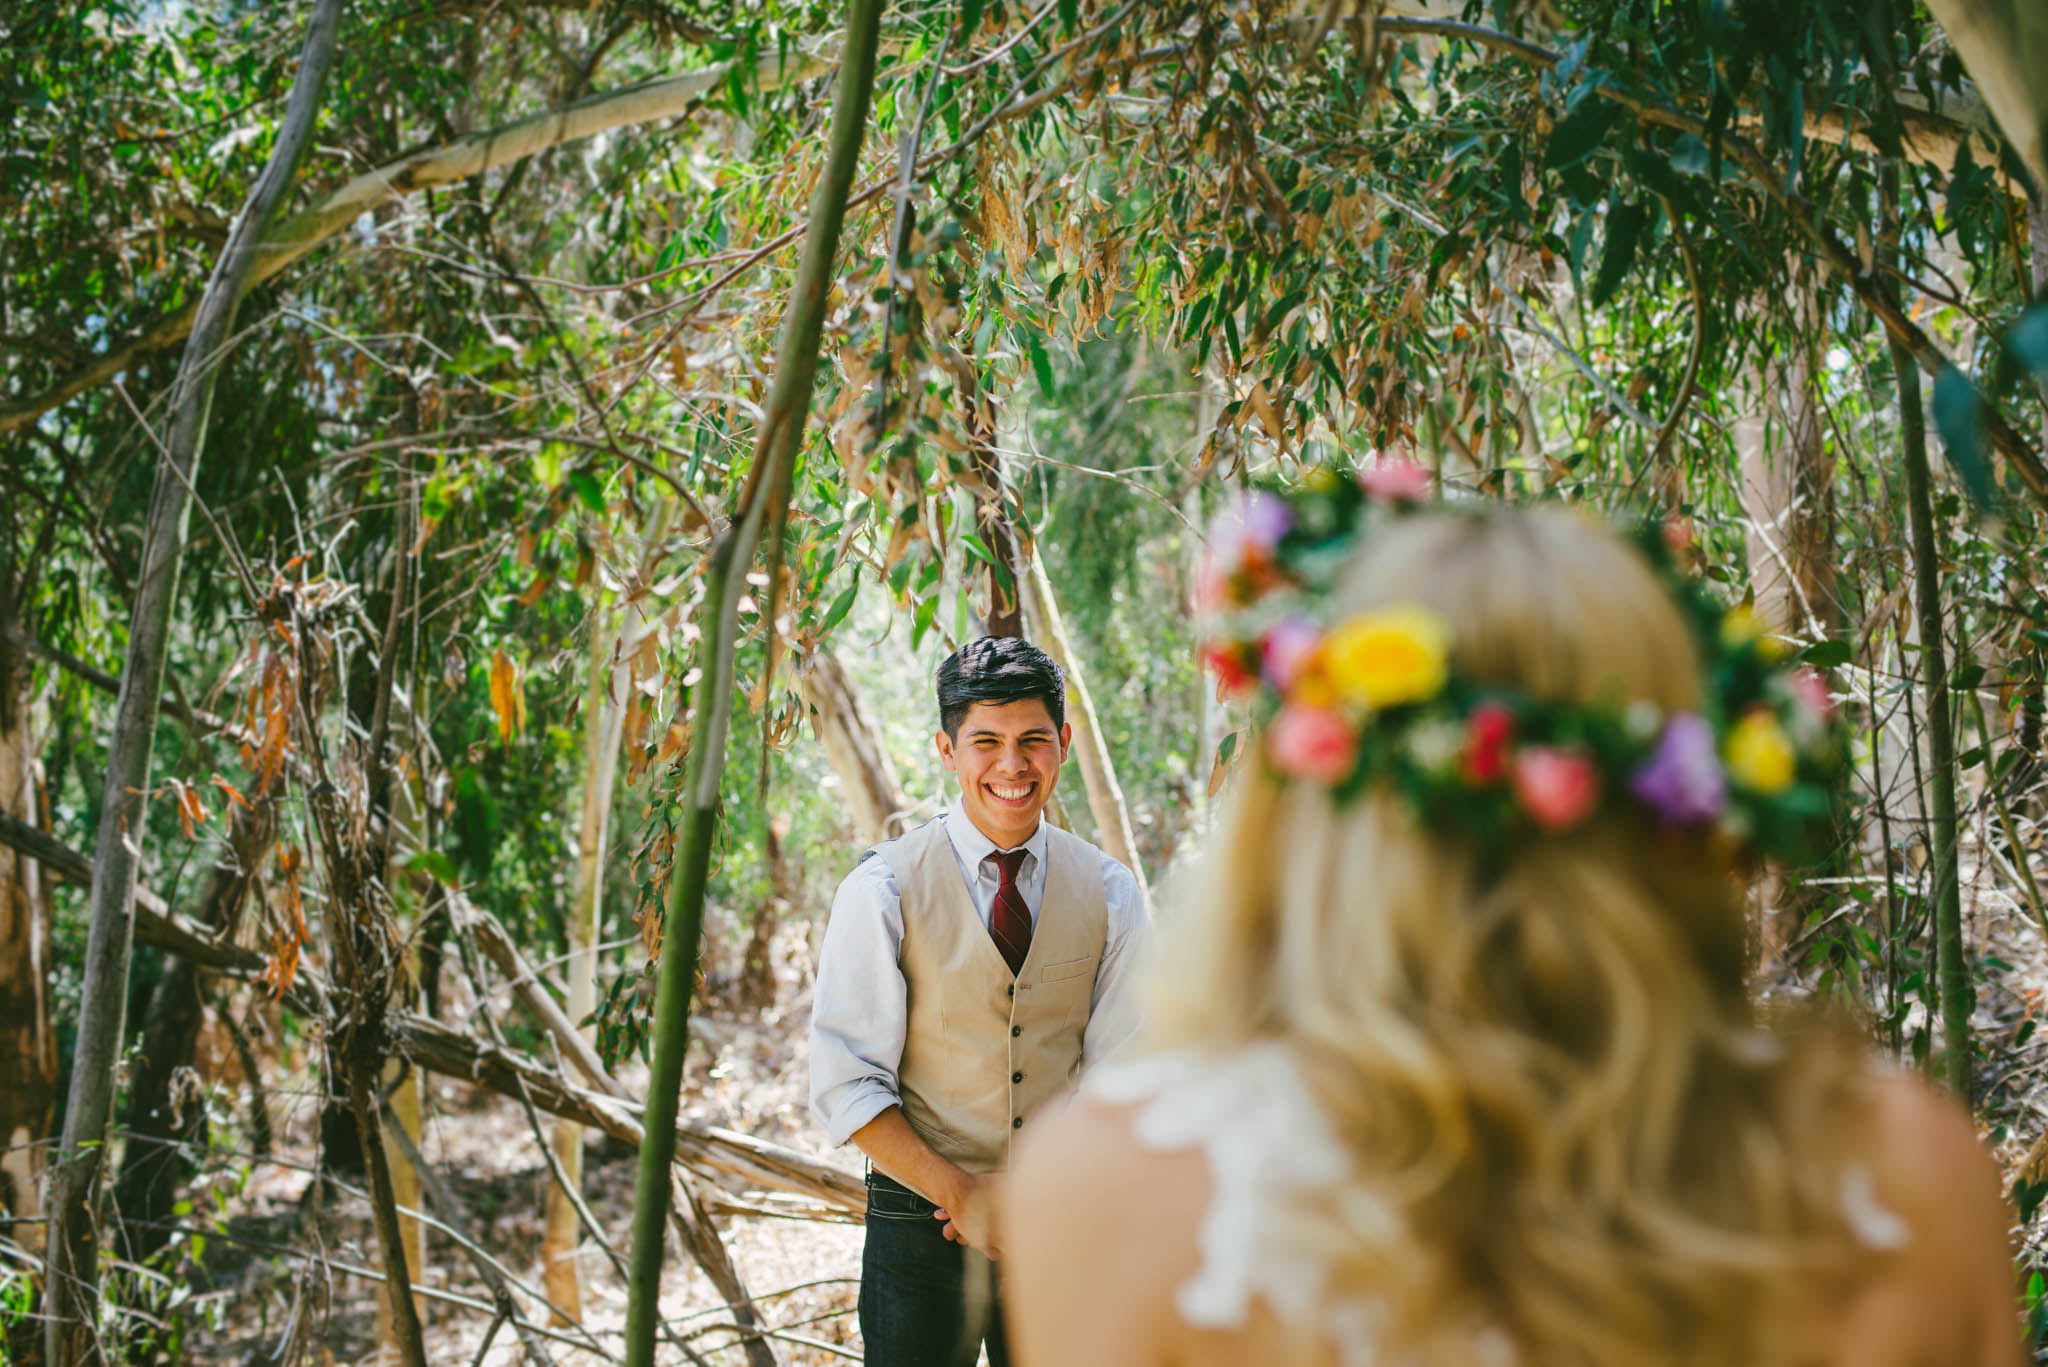 ©Isaiah & Taylor Photography - Los Angeles Wedding Photographer - Mexican Bohemian Wedding, Laguna Niguel Regional Park, Orange County-10.jpg